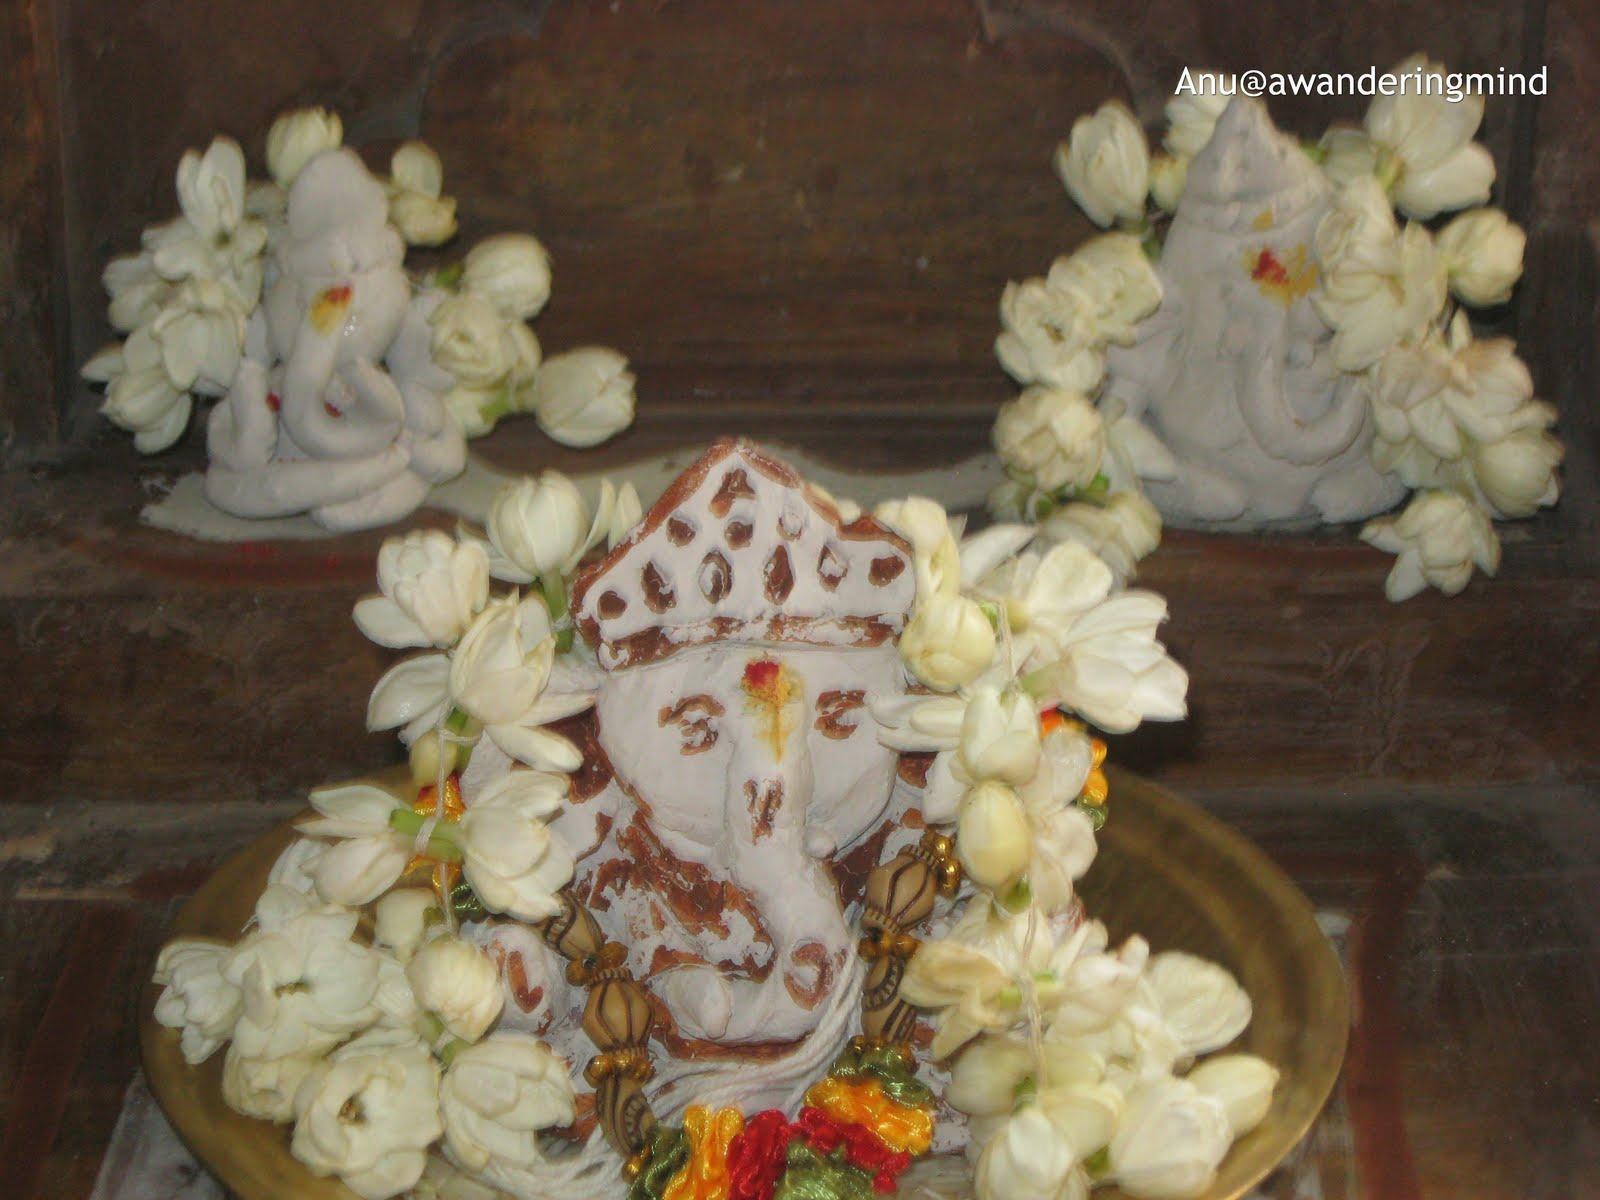 Ganesh chaturthi flowers may flower blog - Lord Ganesha Clay Idols An Eco Friendly Ganpati Celebration In Mumbai